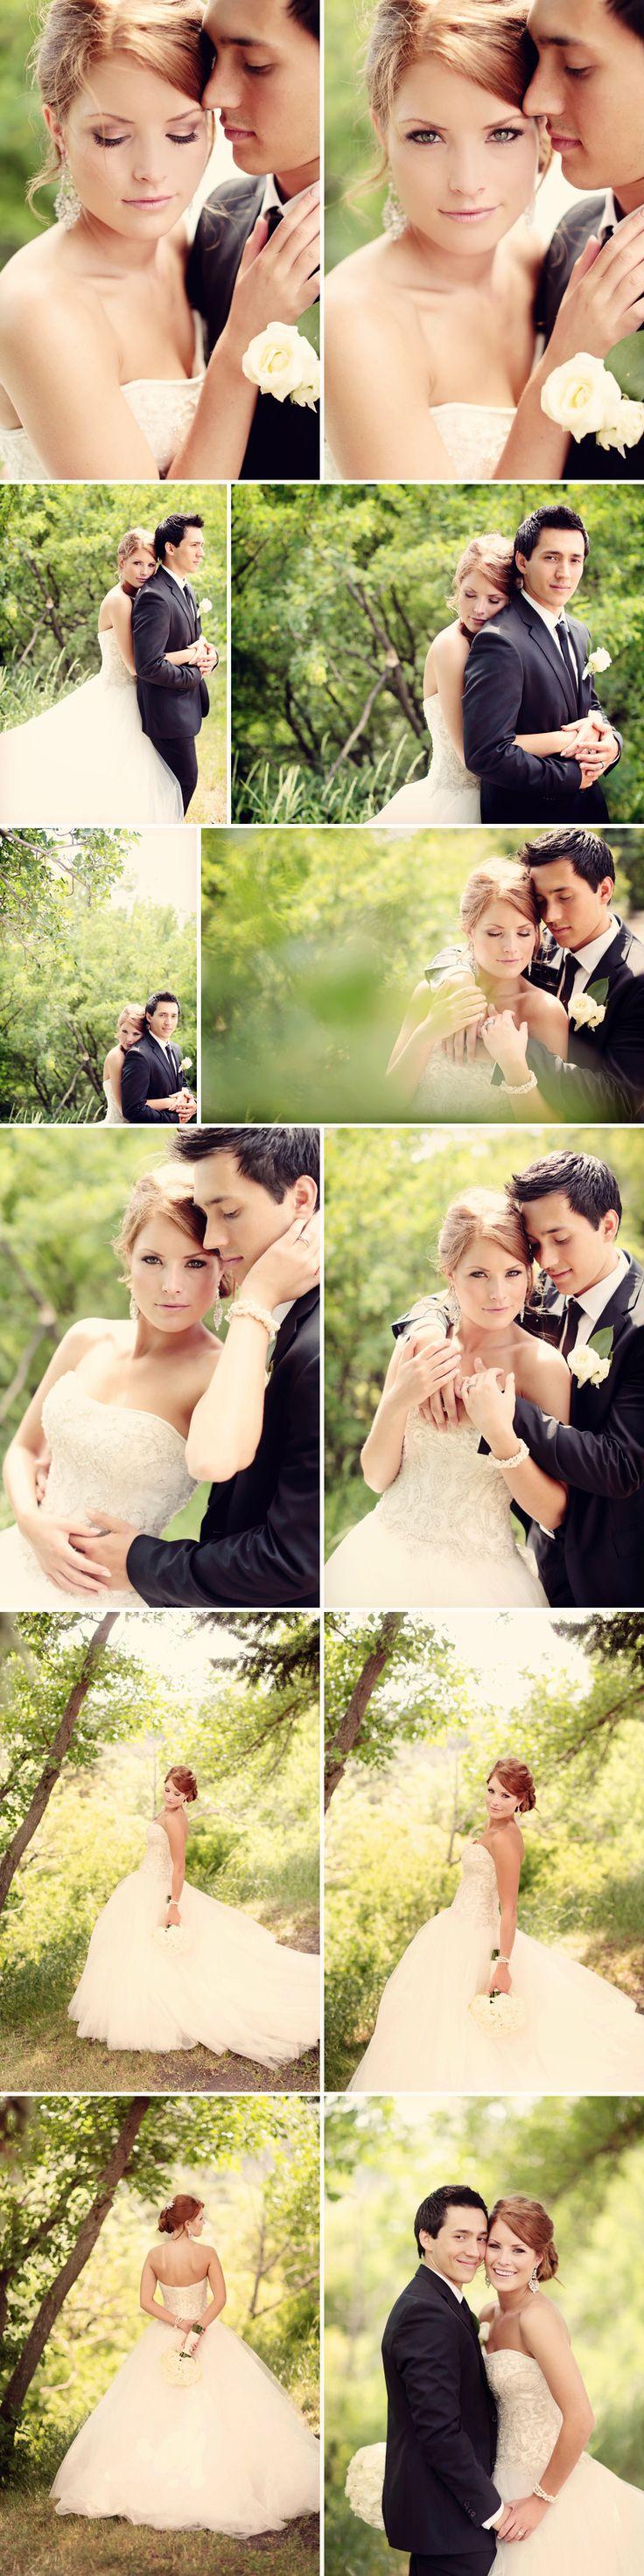 ©Eternal Reflections Photography Luxury Edmonton & International Wedding photography royal alberta museum wedding photographer